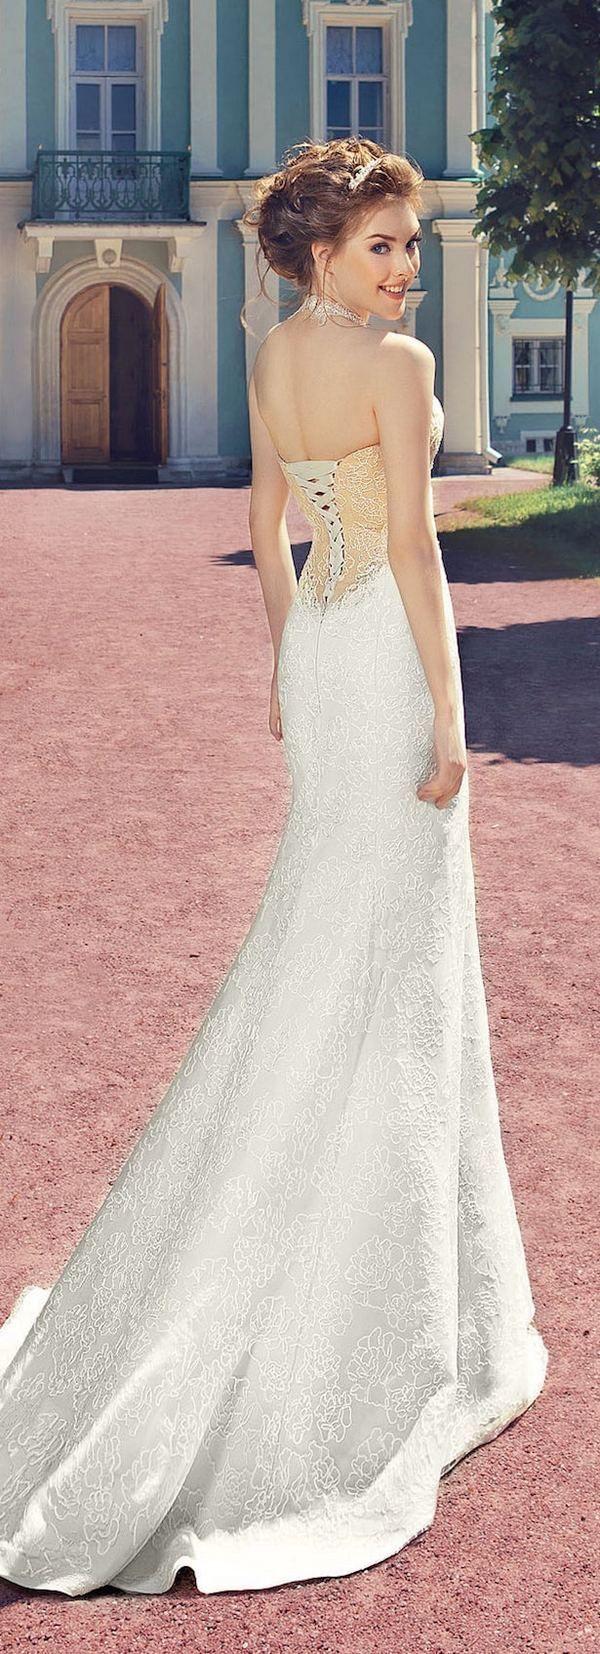 Wedding-Dresses-0640